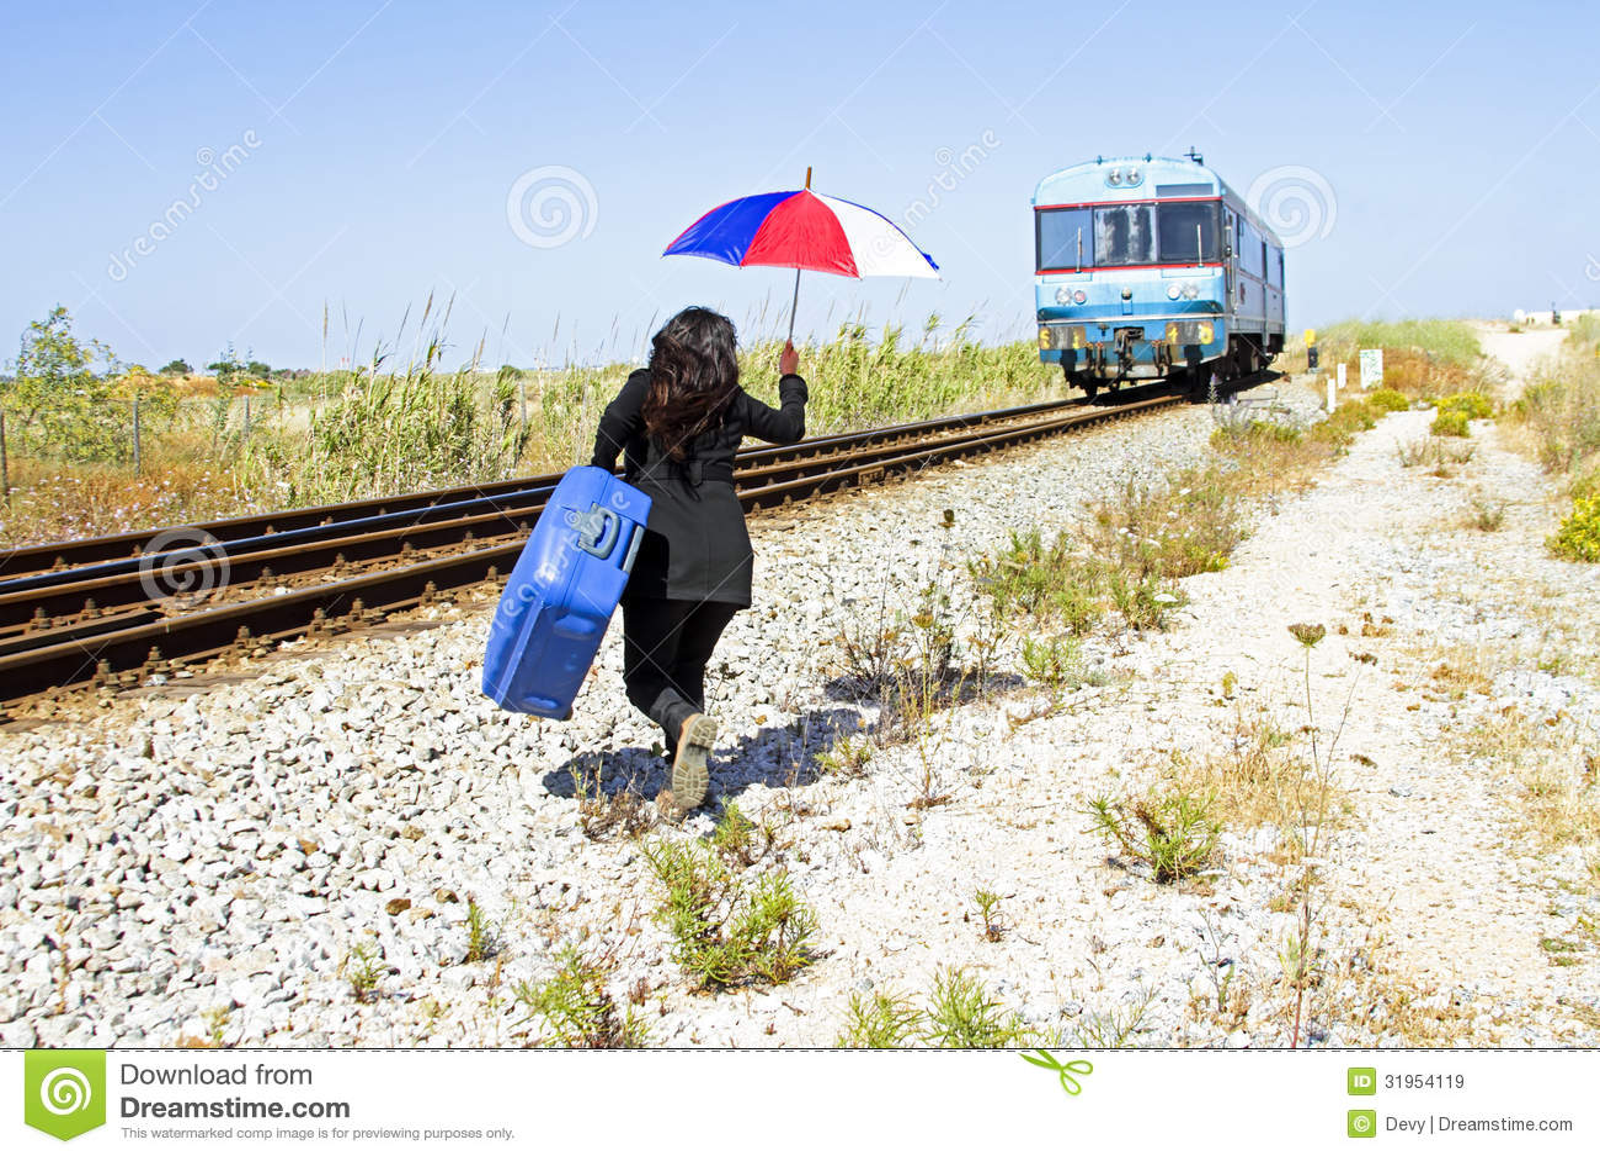 nude girls running a train